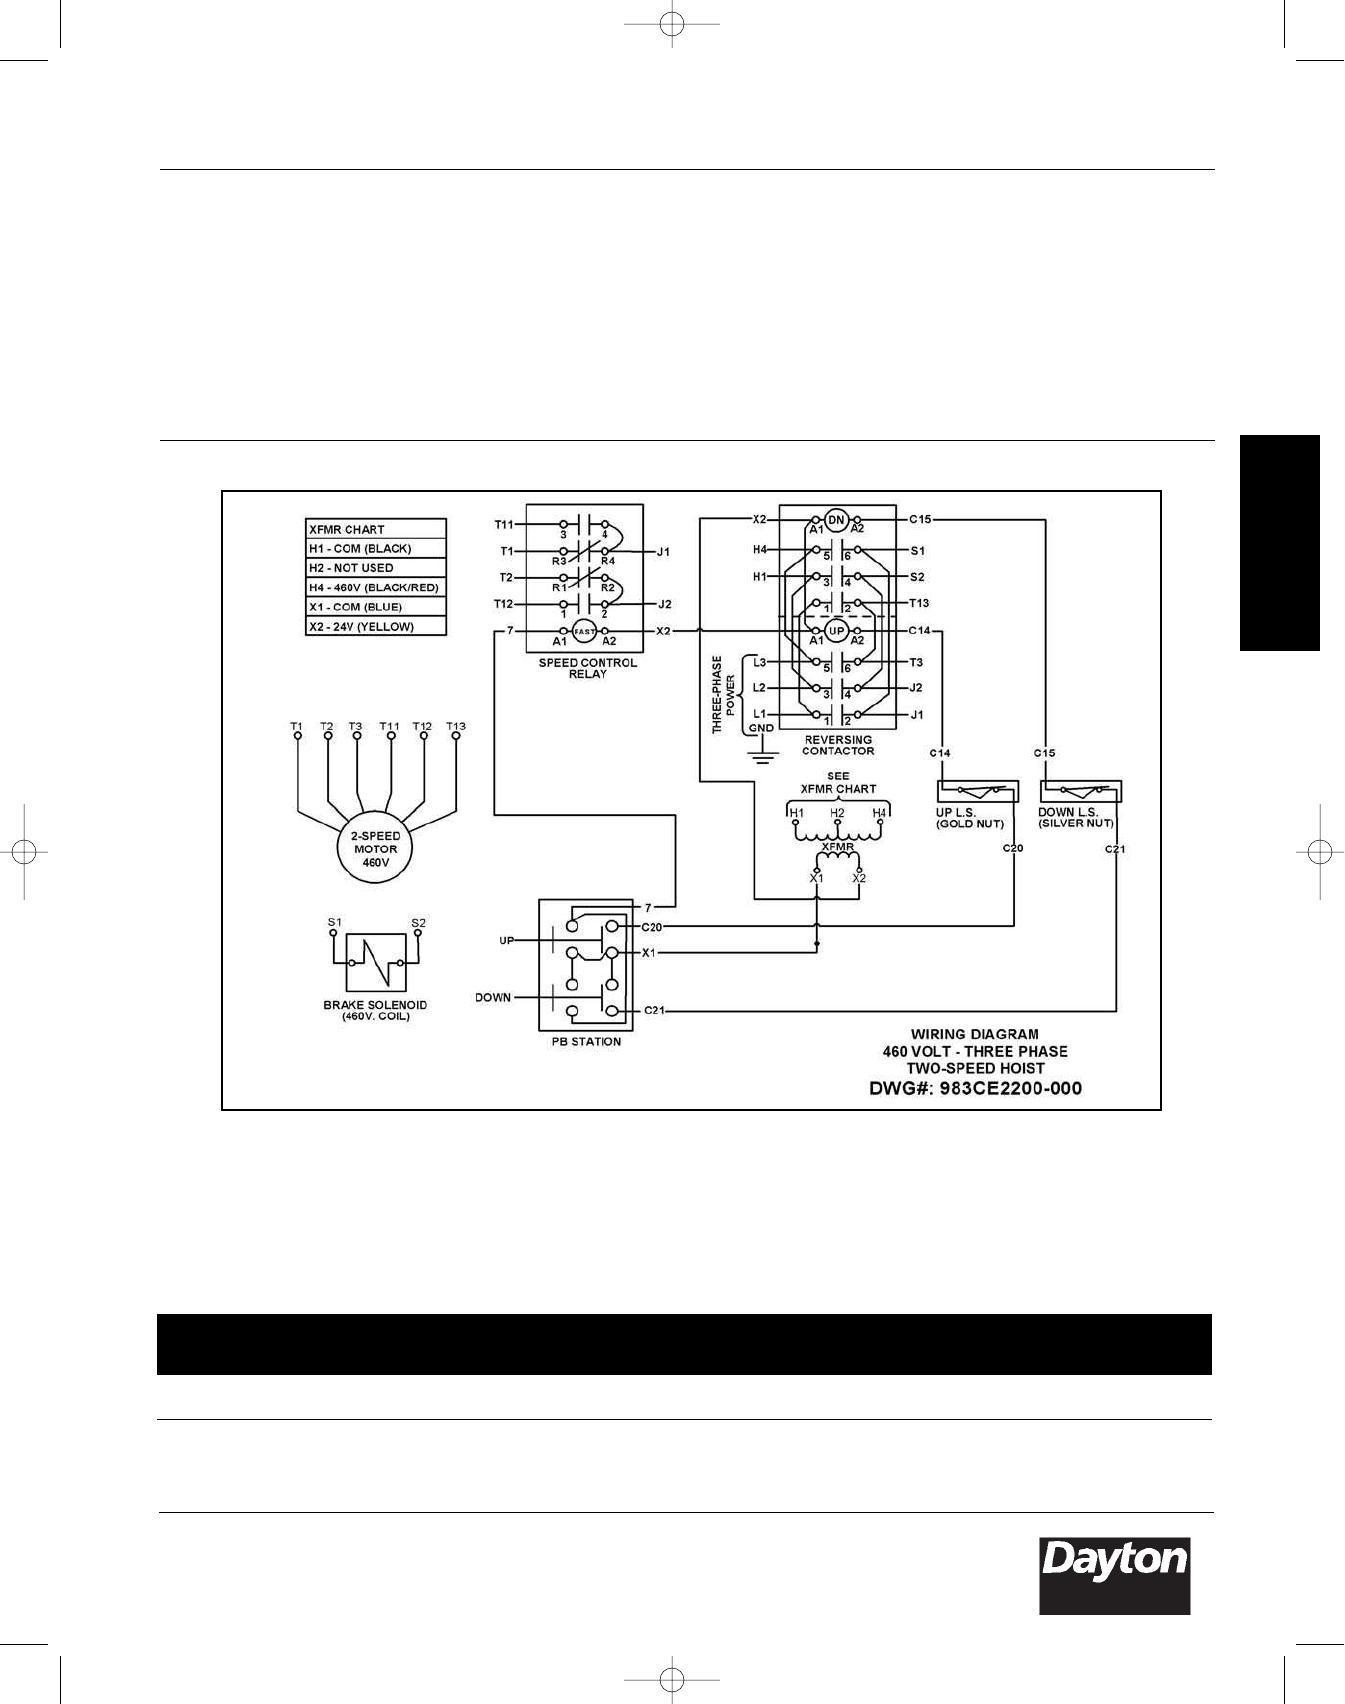 Dayton 3yb72 3yb99 3ye10 3ye15 Operating Instructions And Parts Rh  Rsmanuals Com On Motor Dayton Diagram Parts Electric 3N607 For Dayton 3yb72  3yb99 3ye10 ...